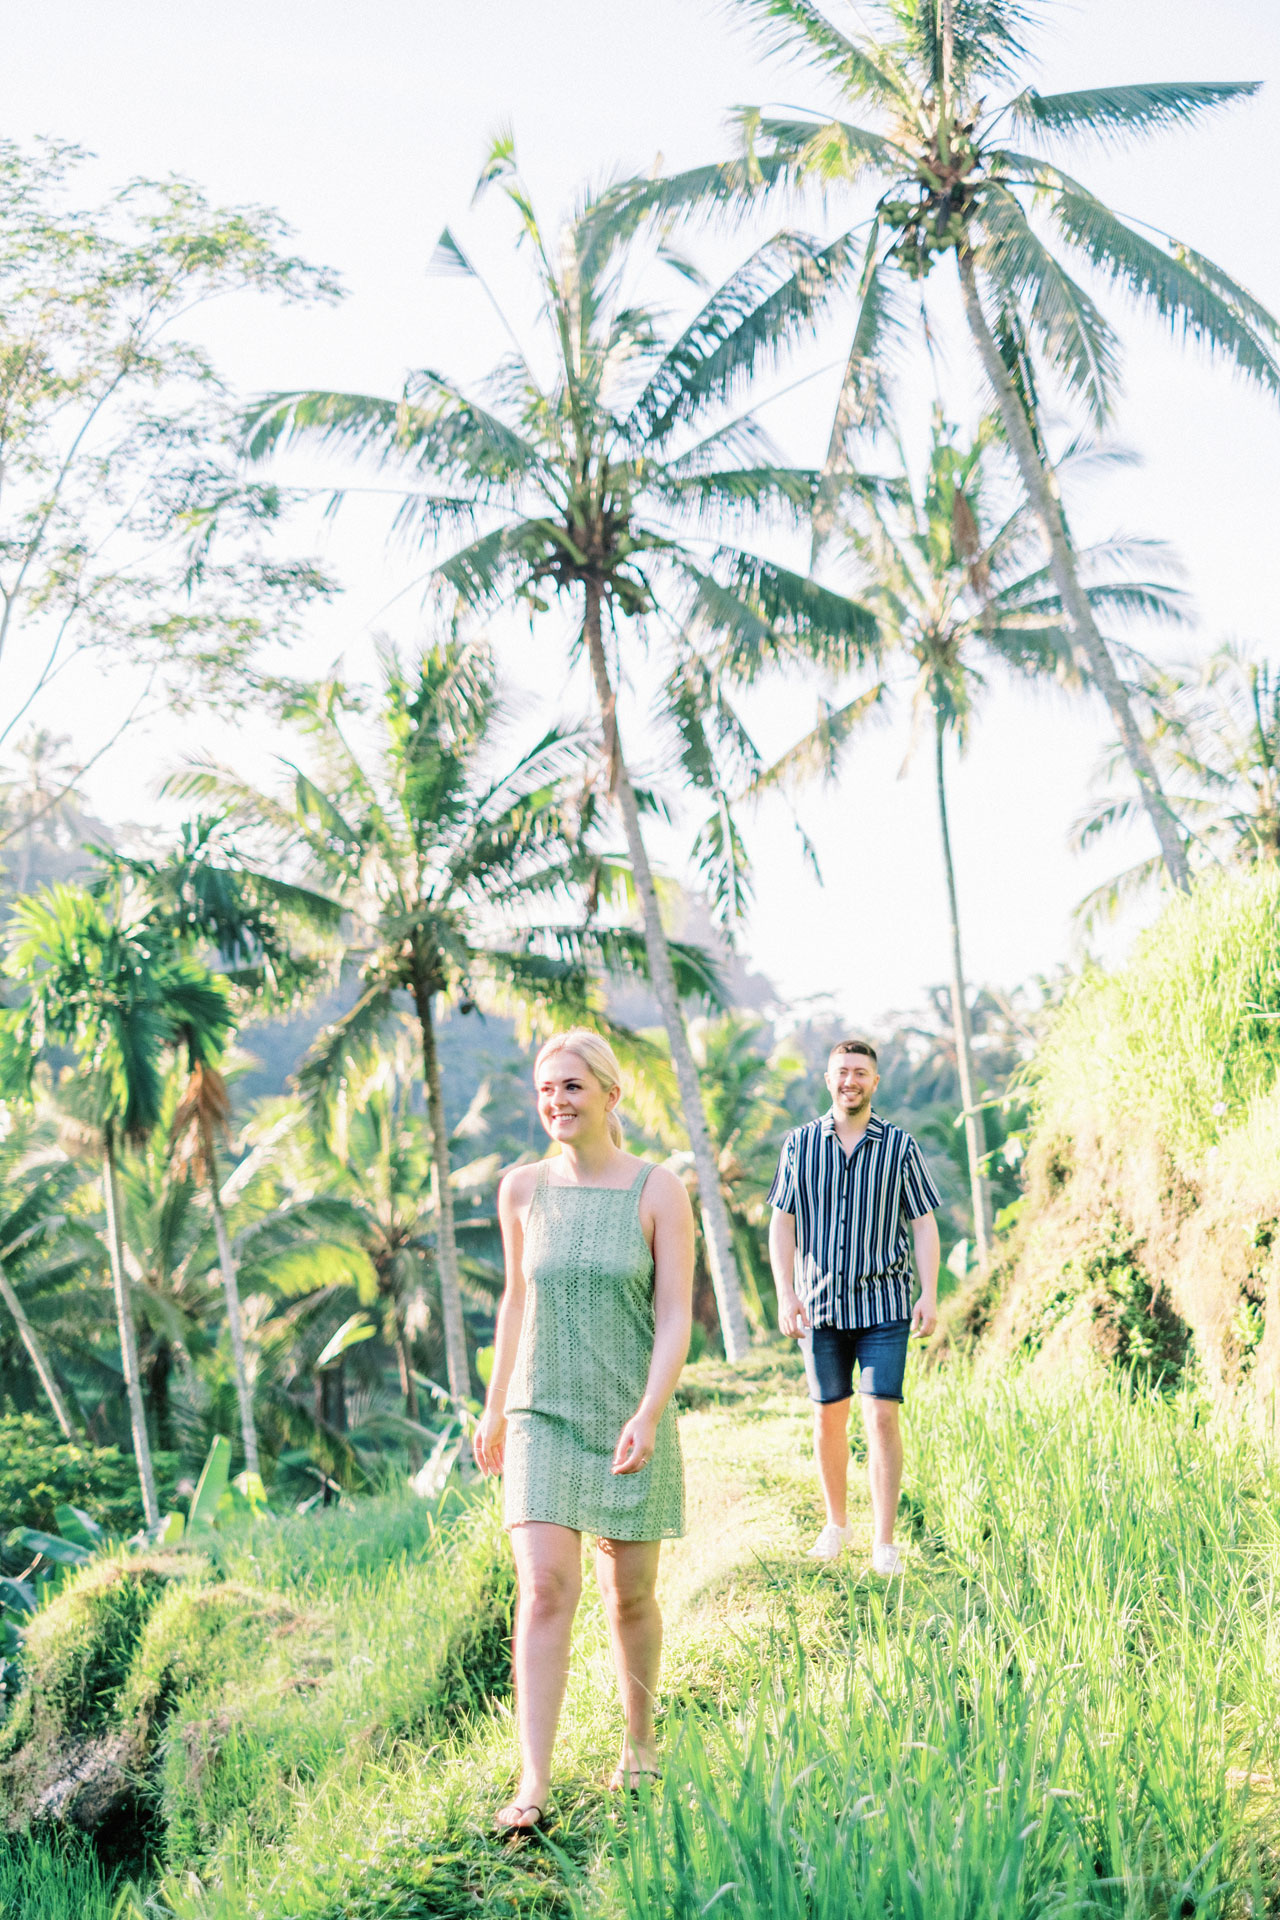 J&J: Proposal Photoshoot in Ubud, Bali 4